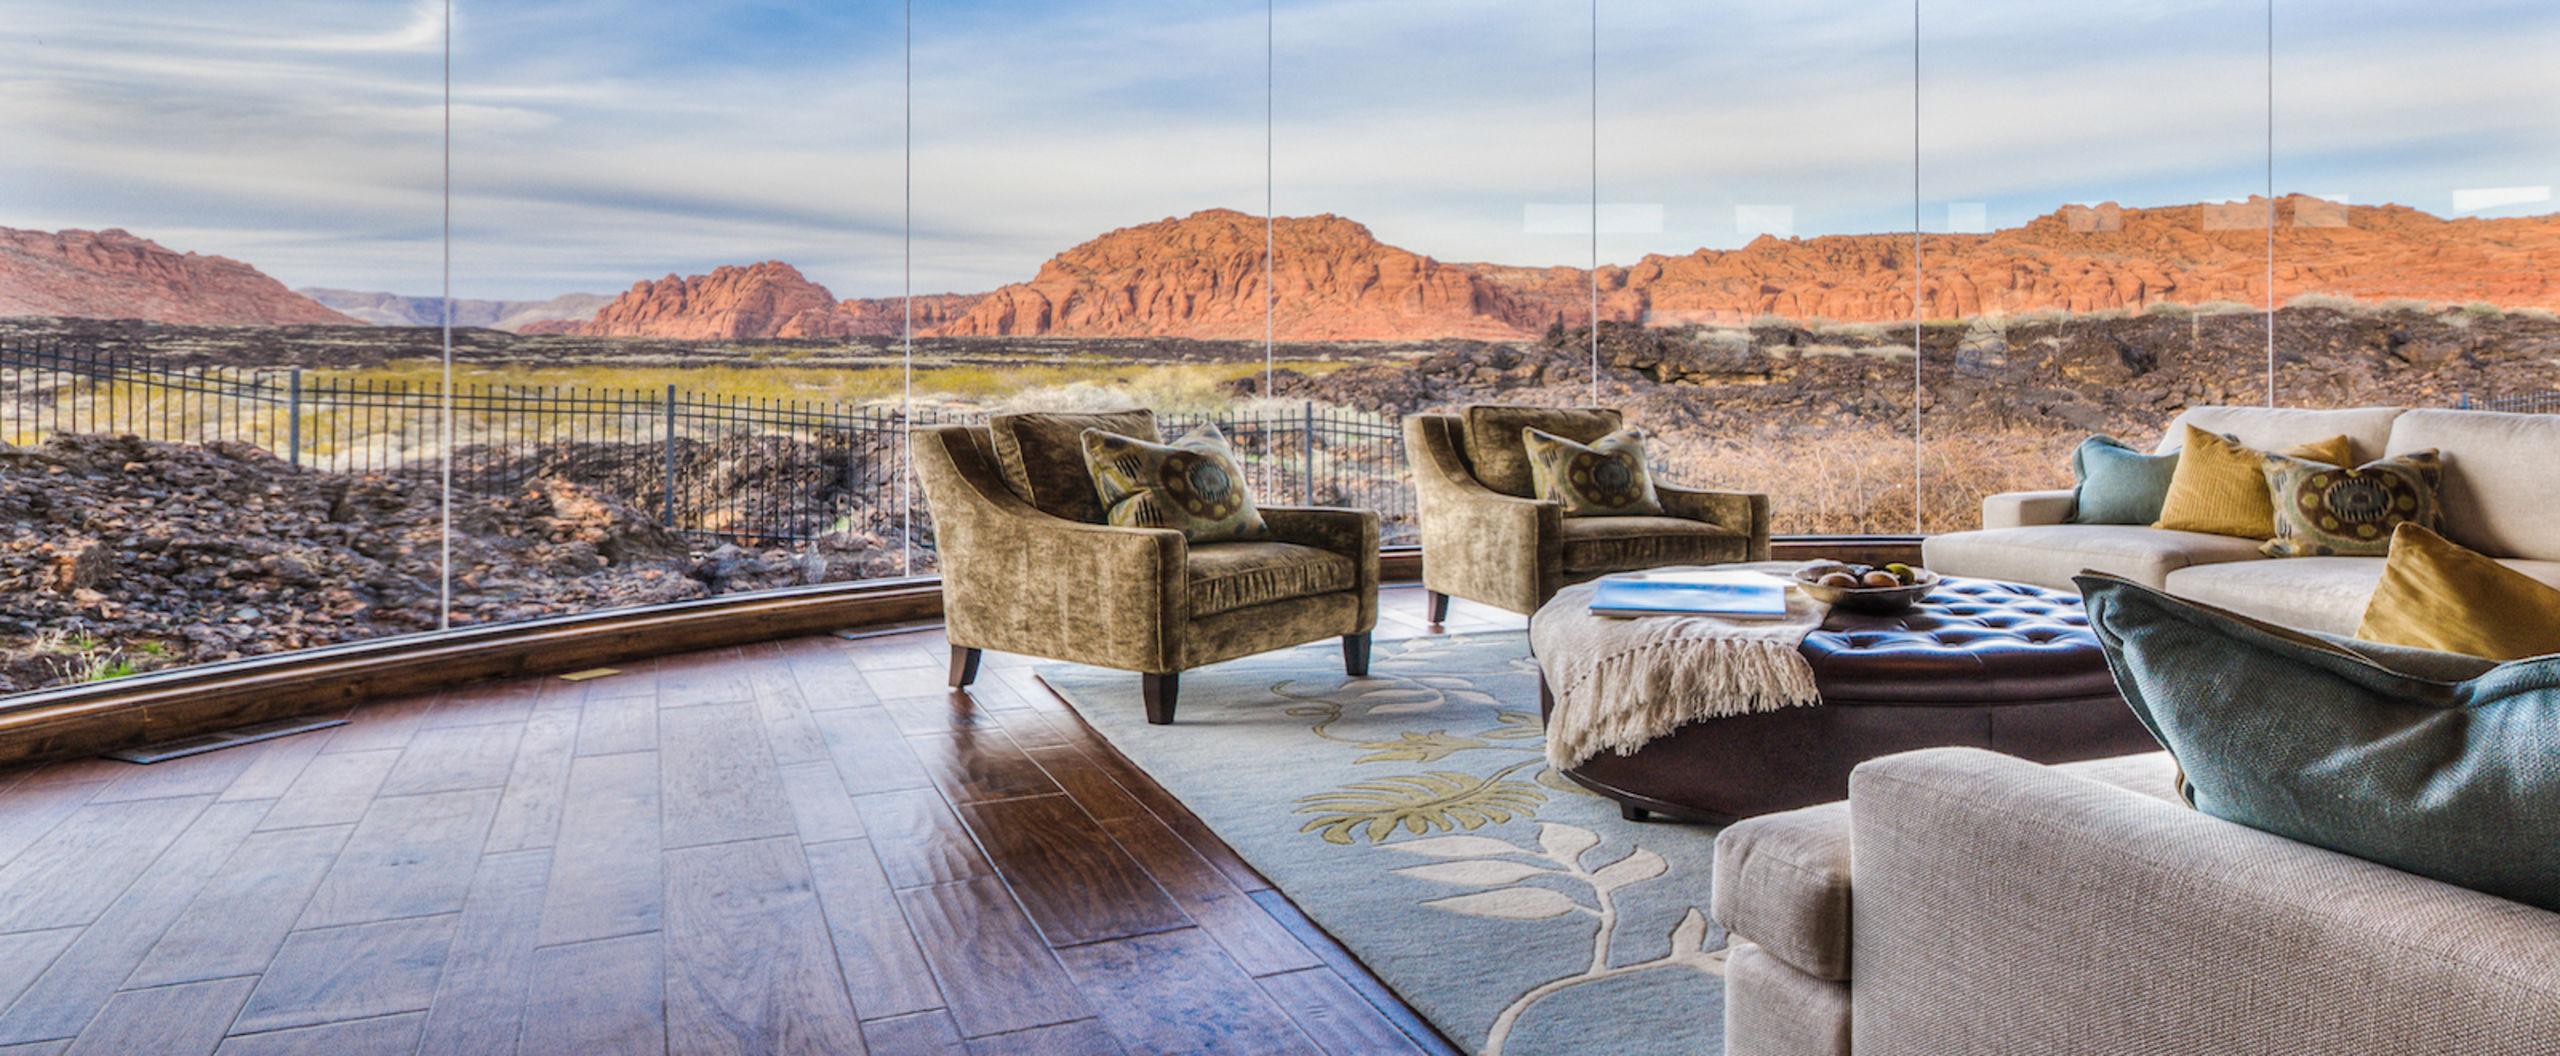 Luxury living in amazing surroundings